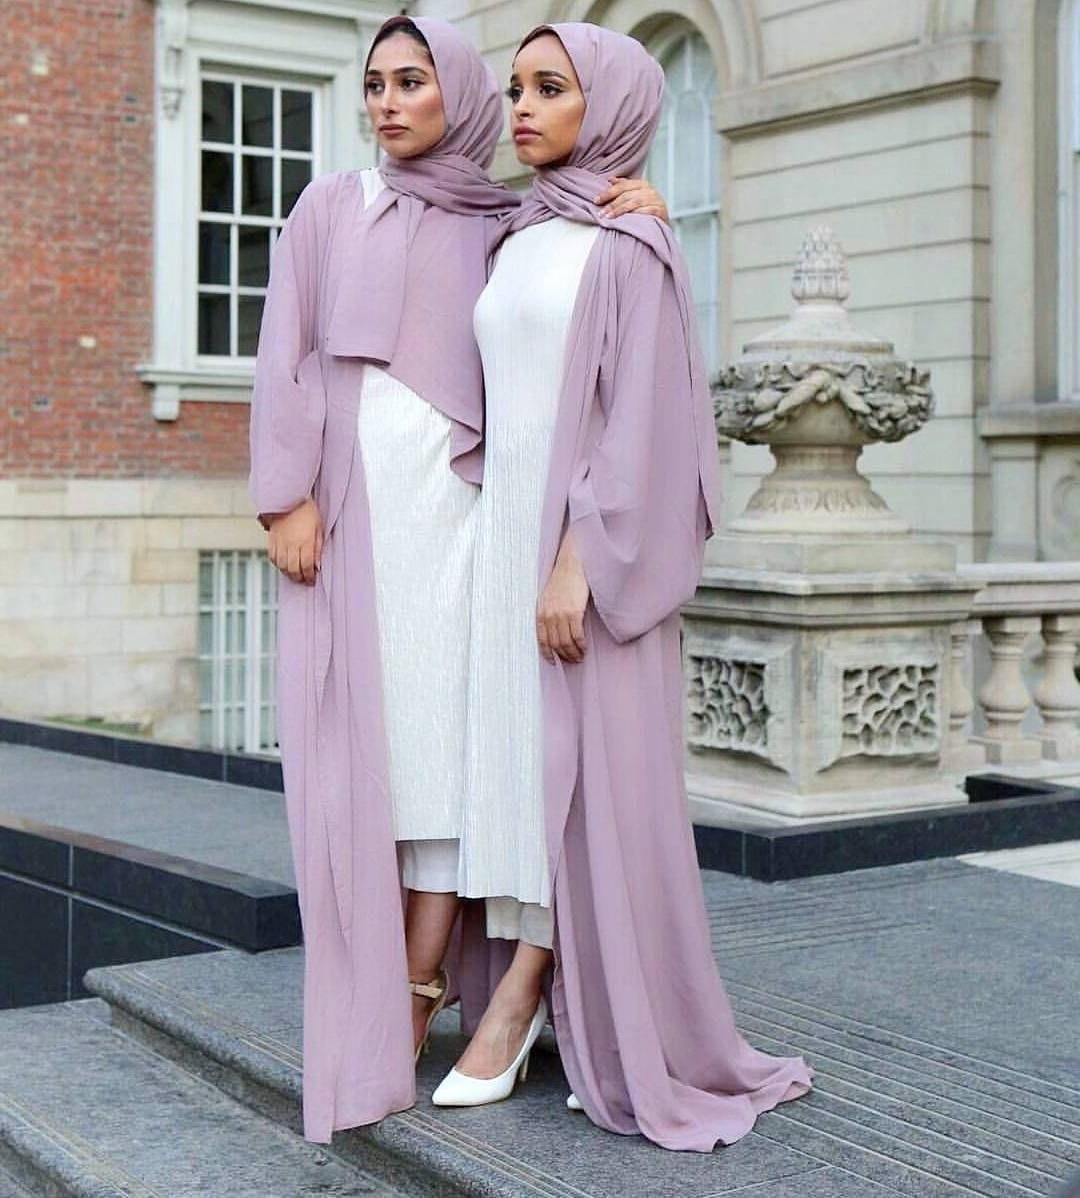 Ide Baju Lebaran Casual 2018 H9d9 50 Model Baju Lebaran Terbaru 2018 Modern & Elegan